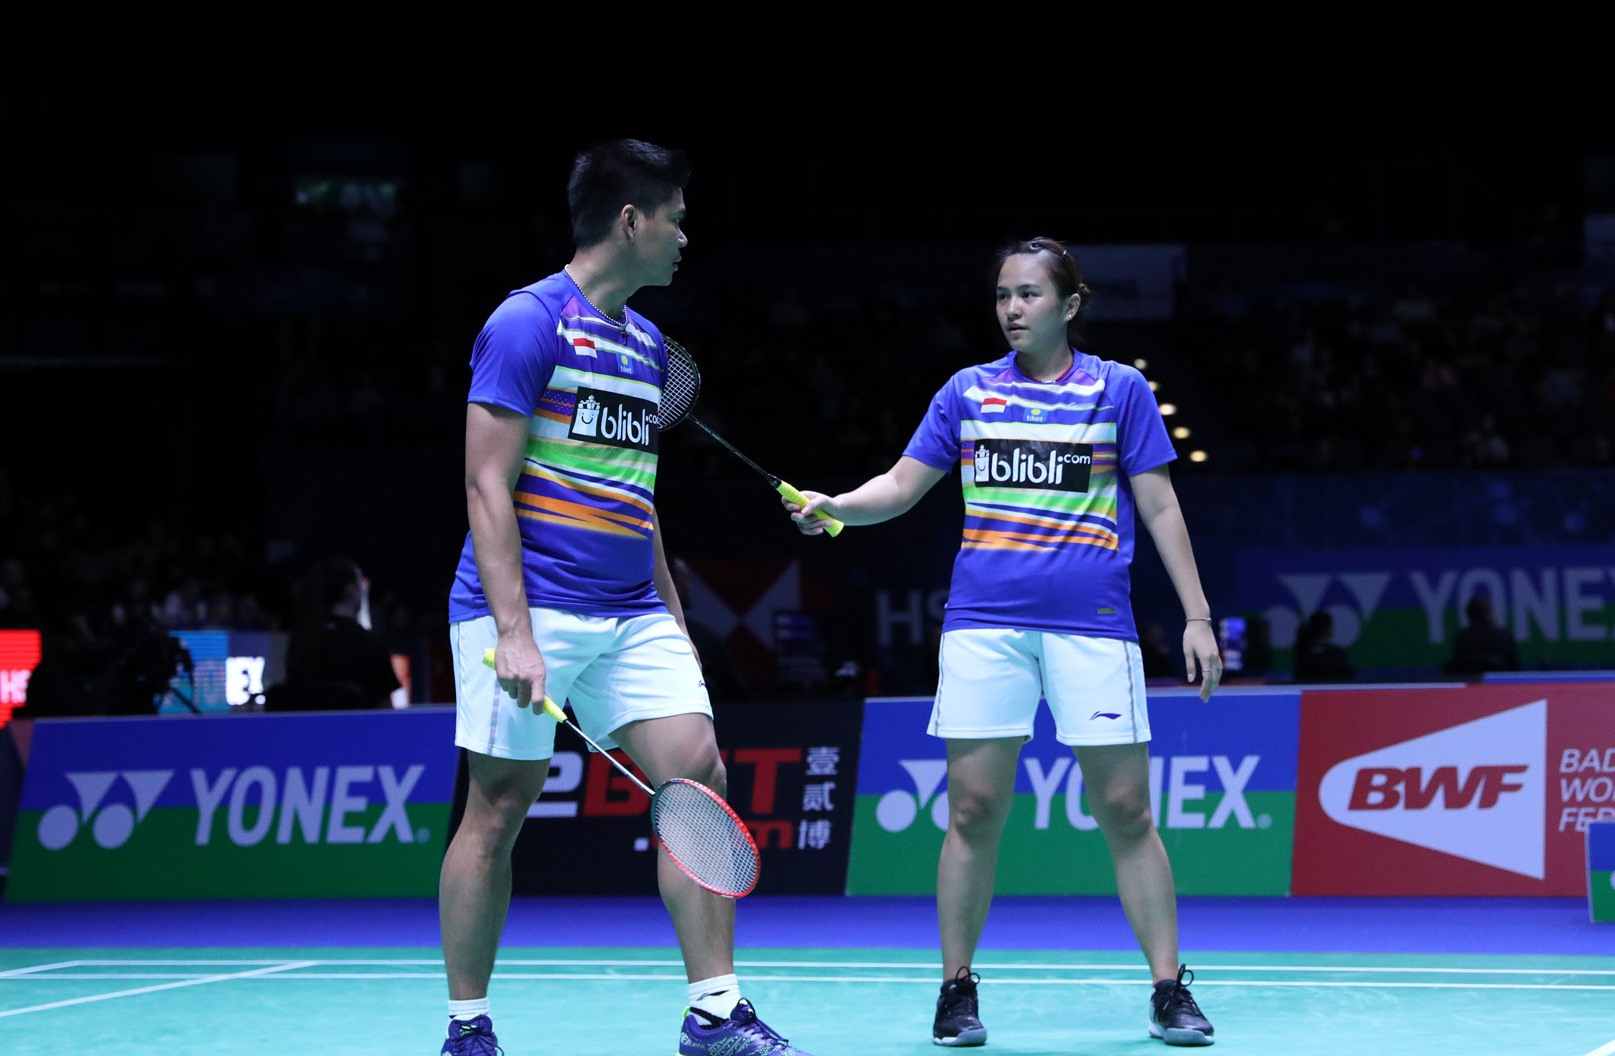 https: img.okezone.com content 2019 03 09 40 2027721 hasil-pertandingan-wakil-indonesia-di-perempatfinal-all-england-2019-1fooA2hdZF.jpg